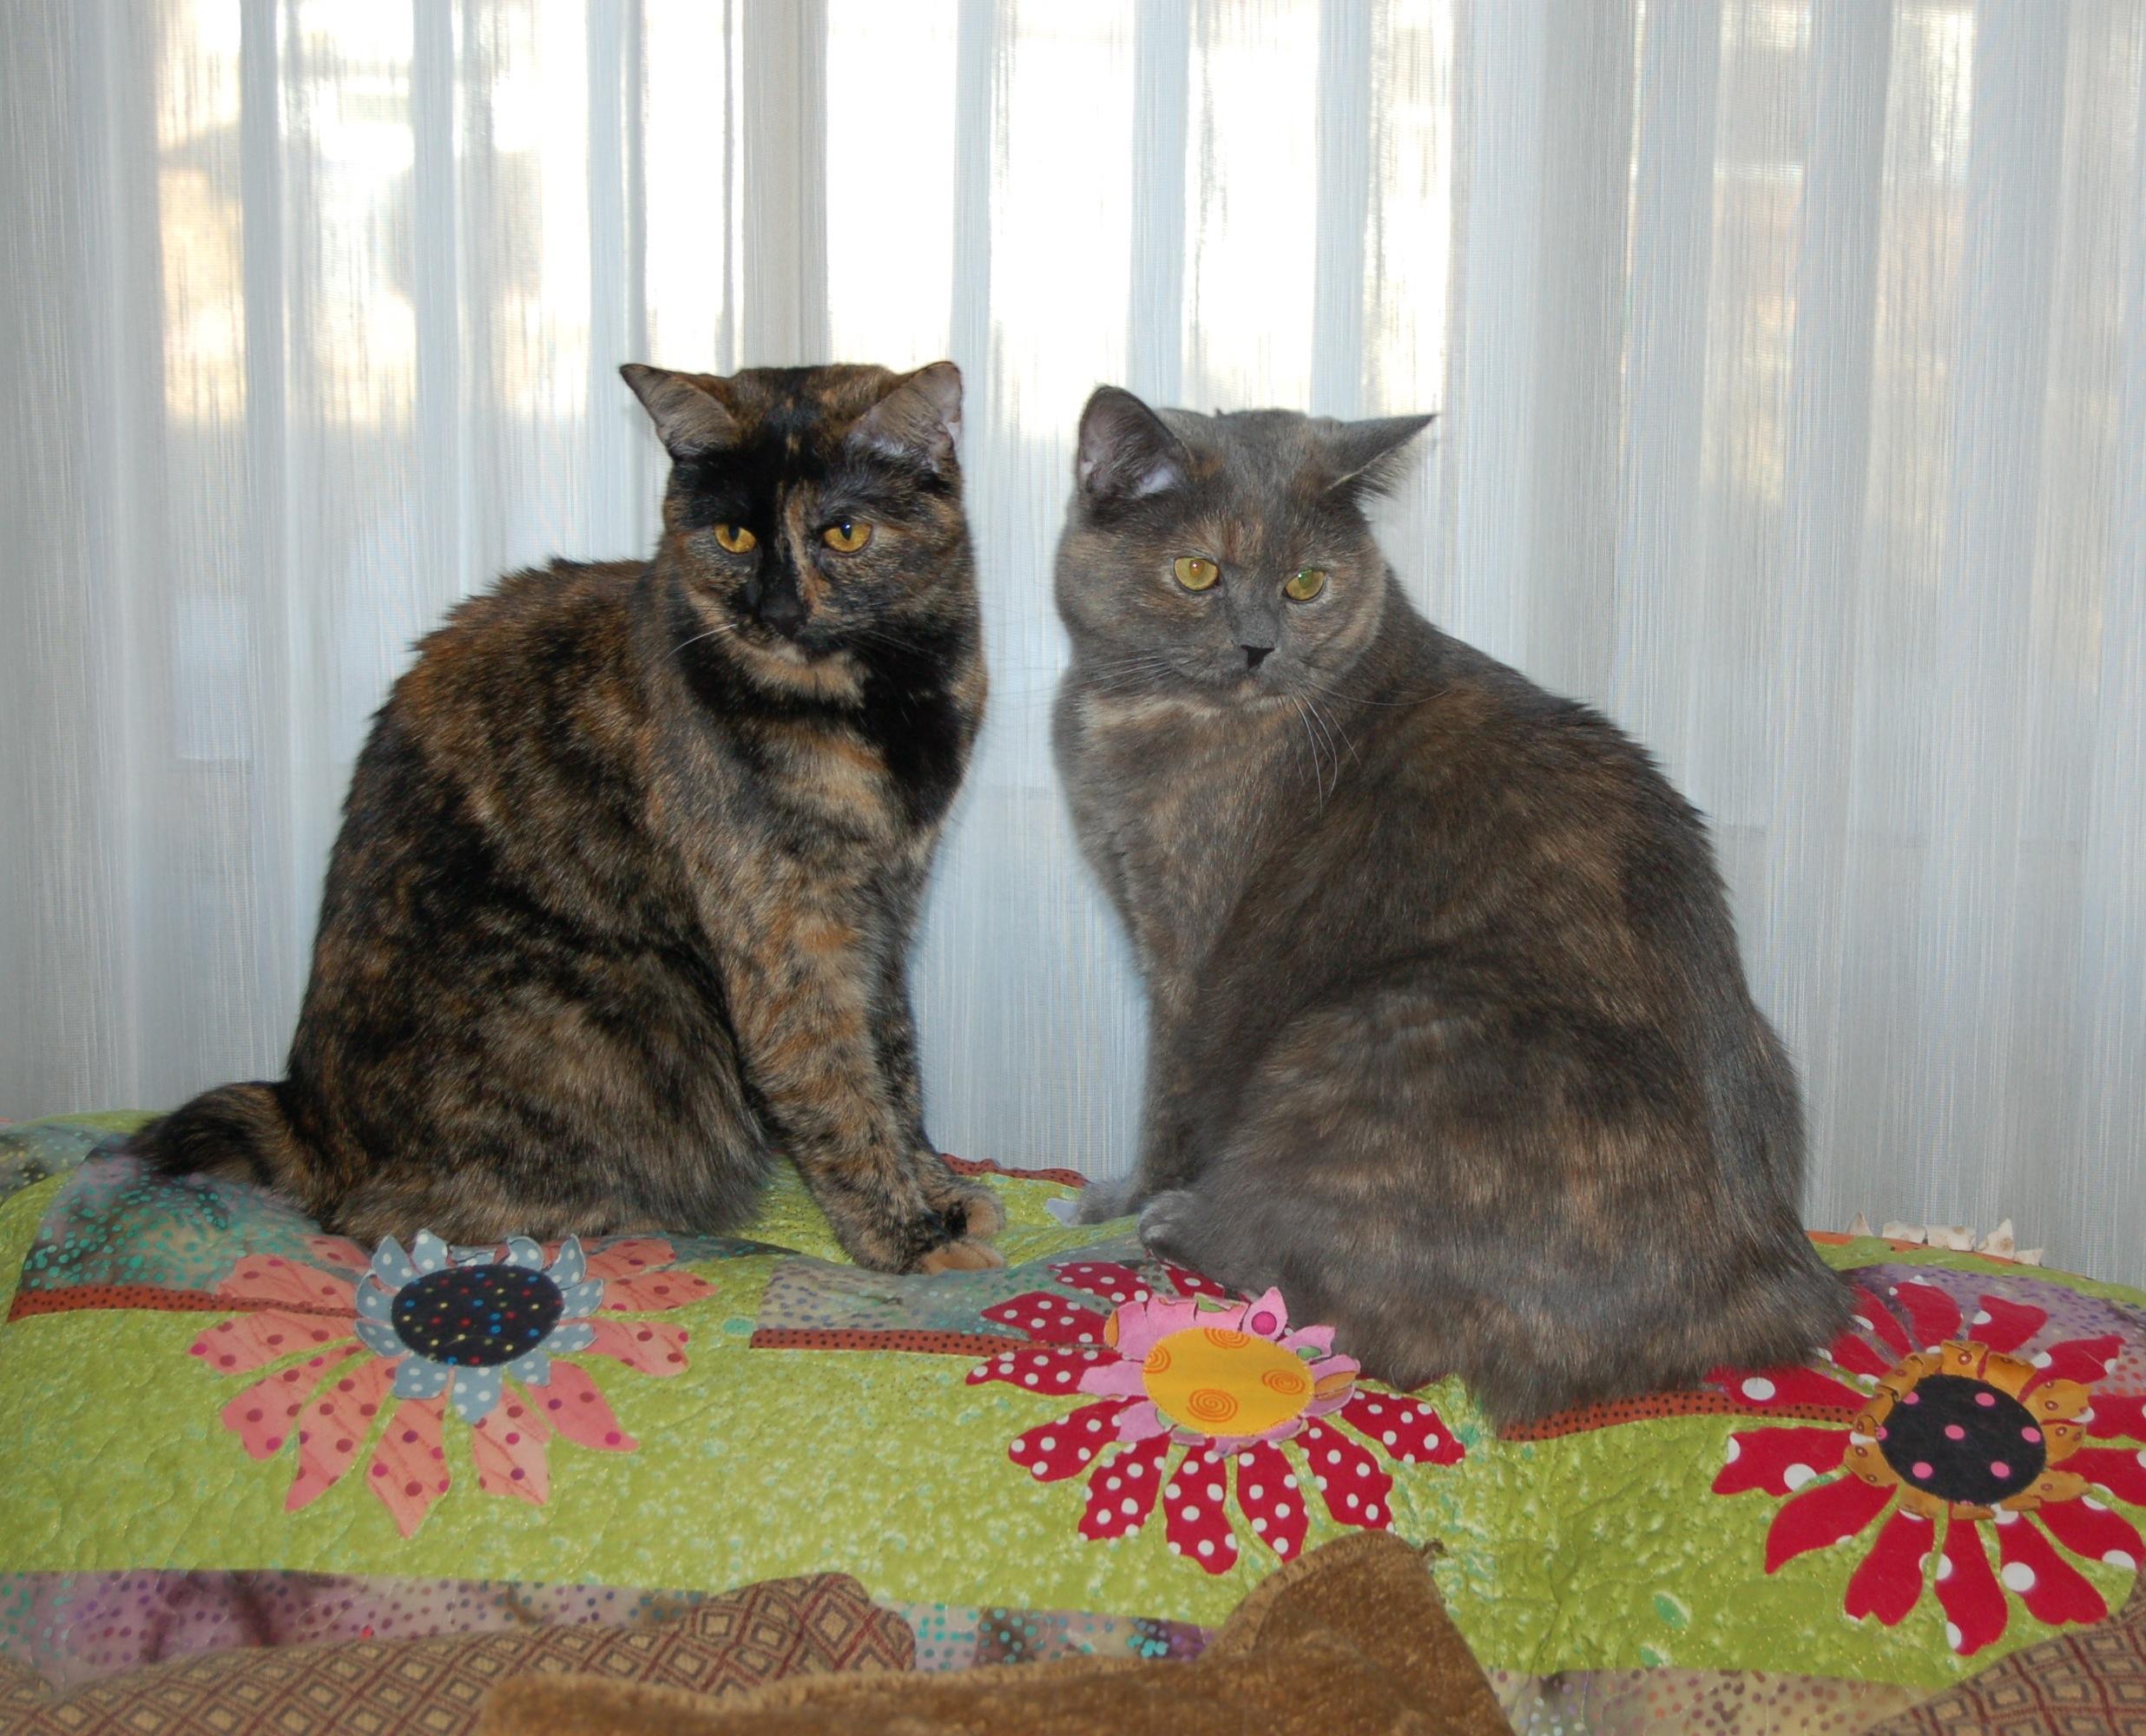 rosie and rachel 1-20-13